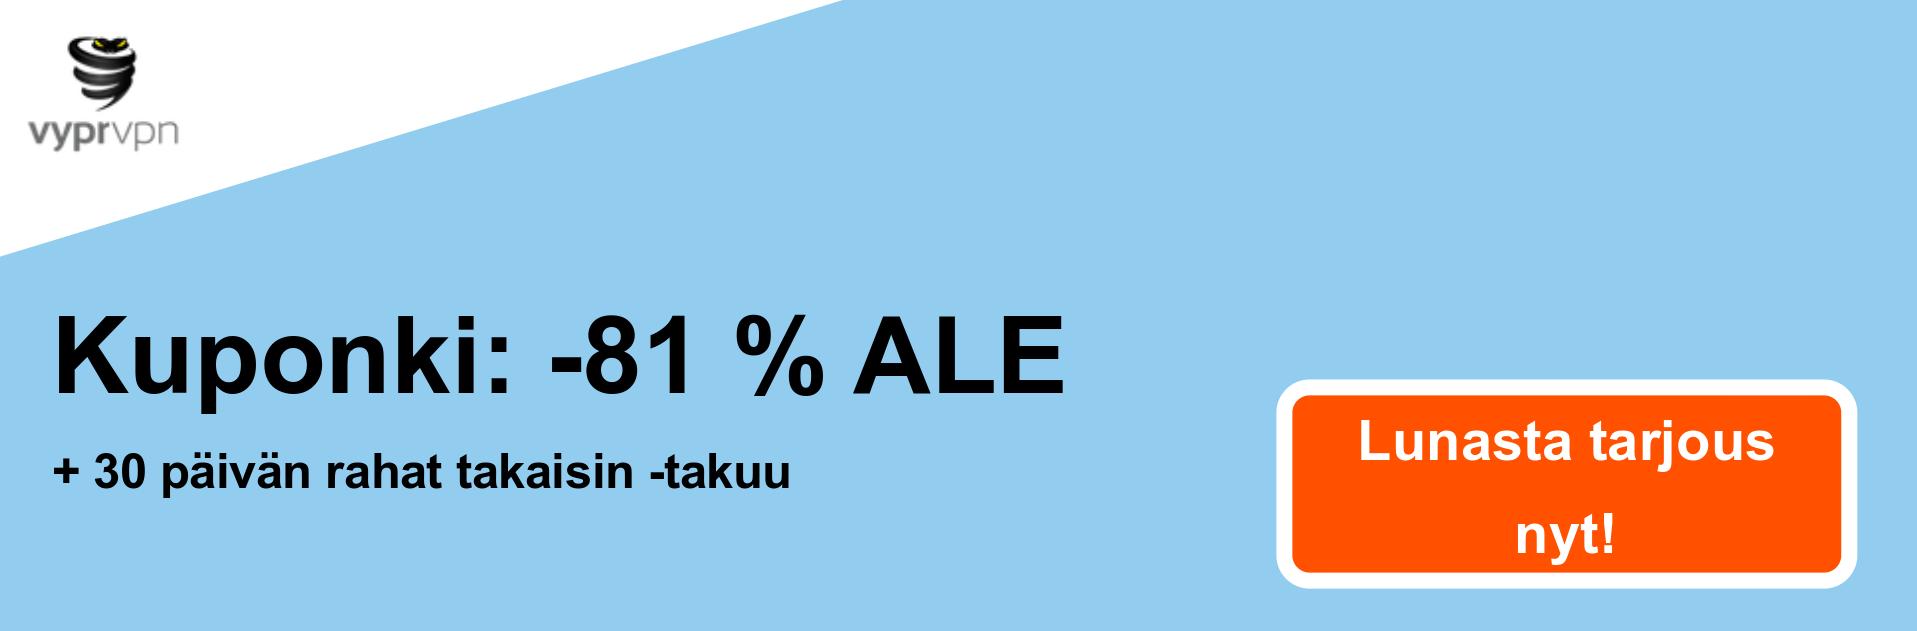 Vypr VPN -kupongin banneri - 81% alennus